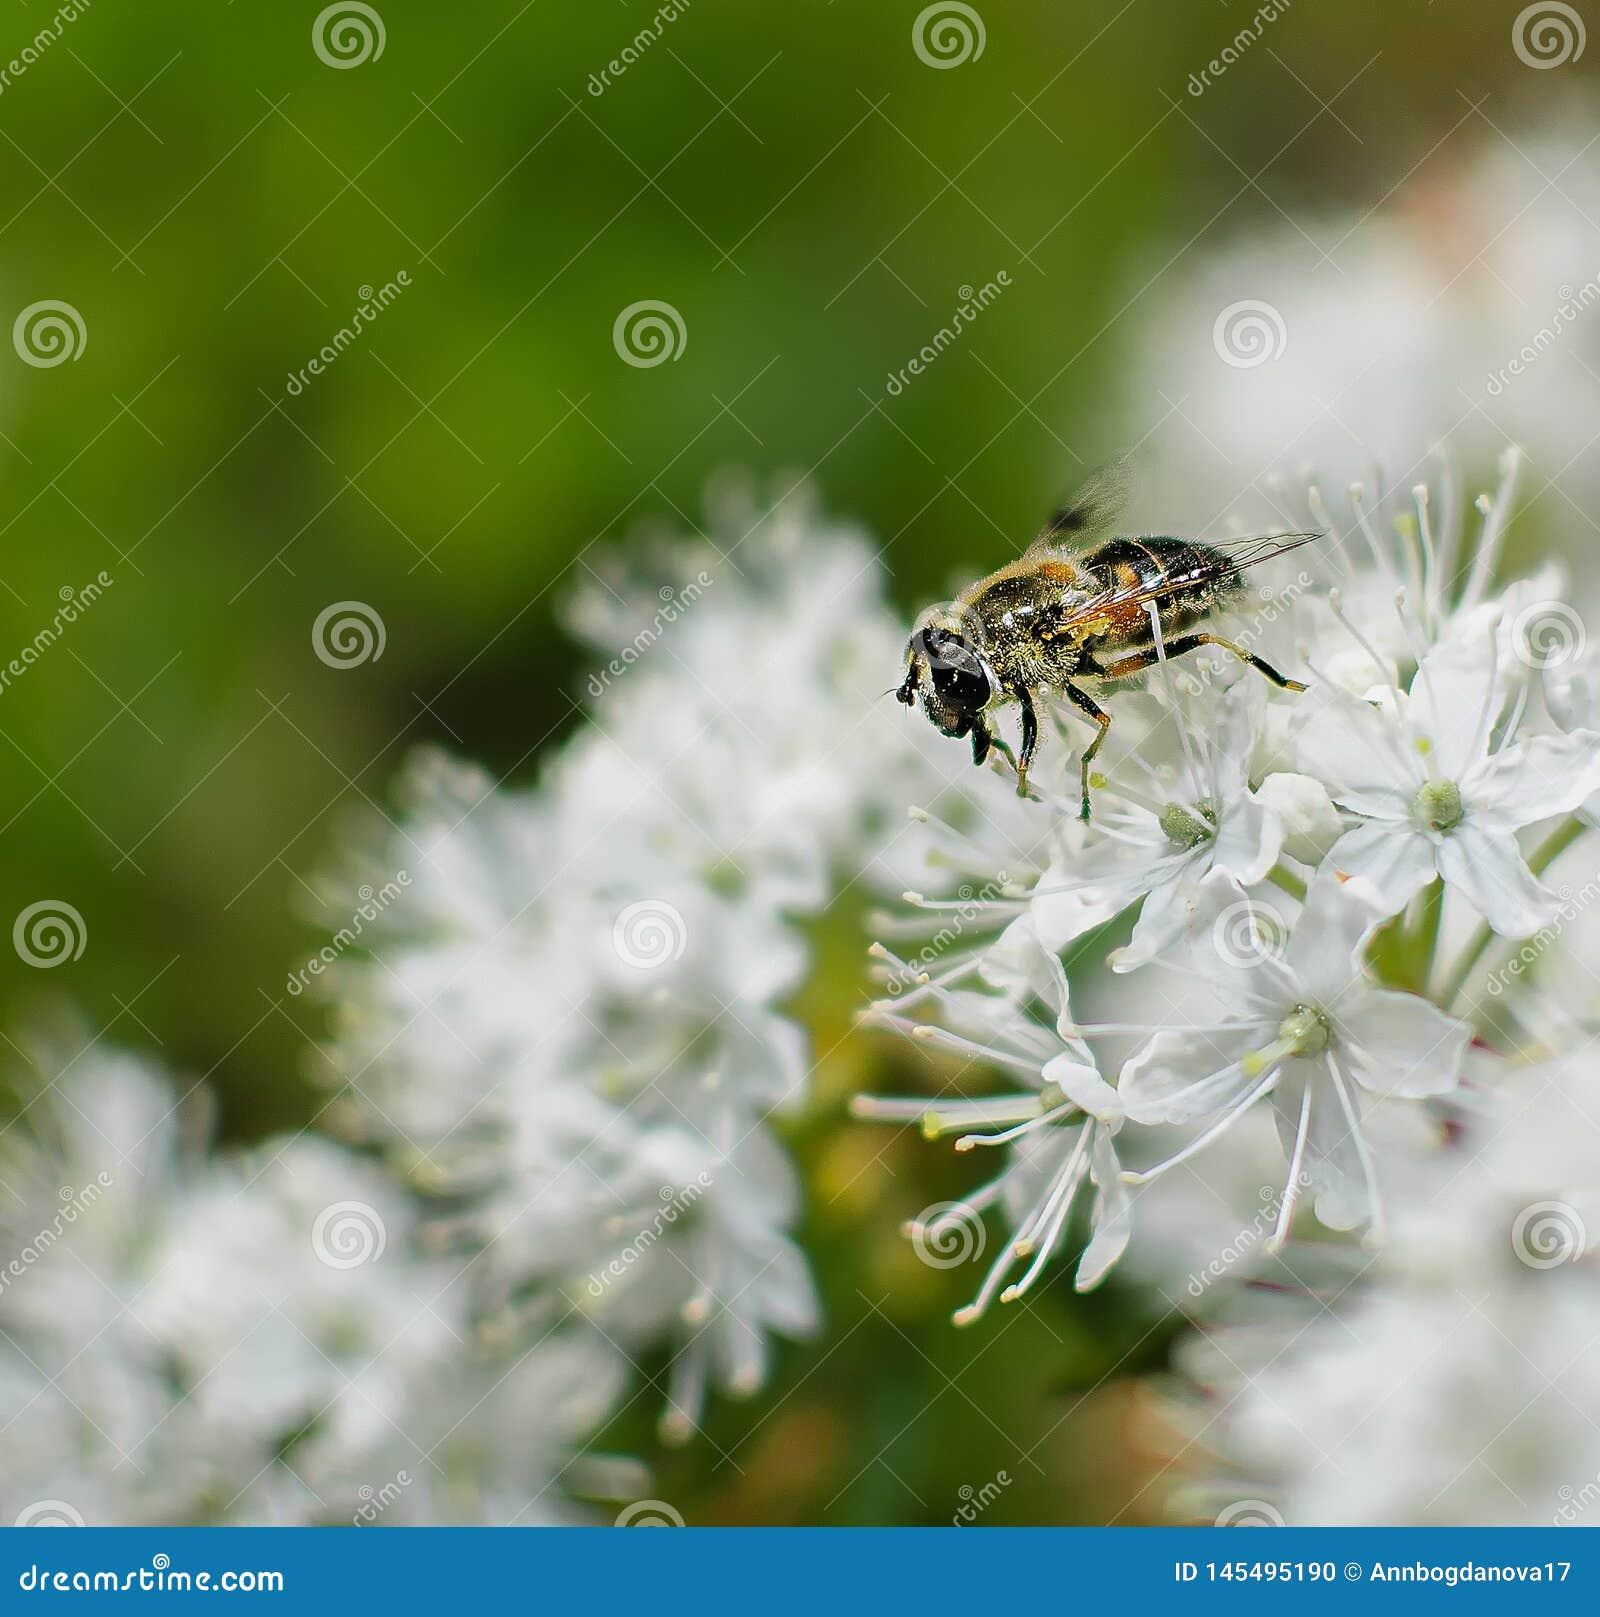 Bee closeup on white wild rosemary flower